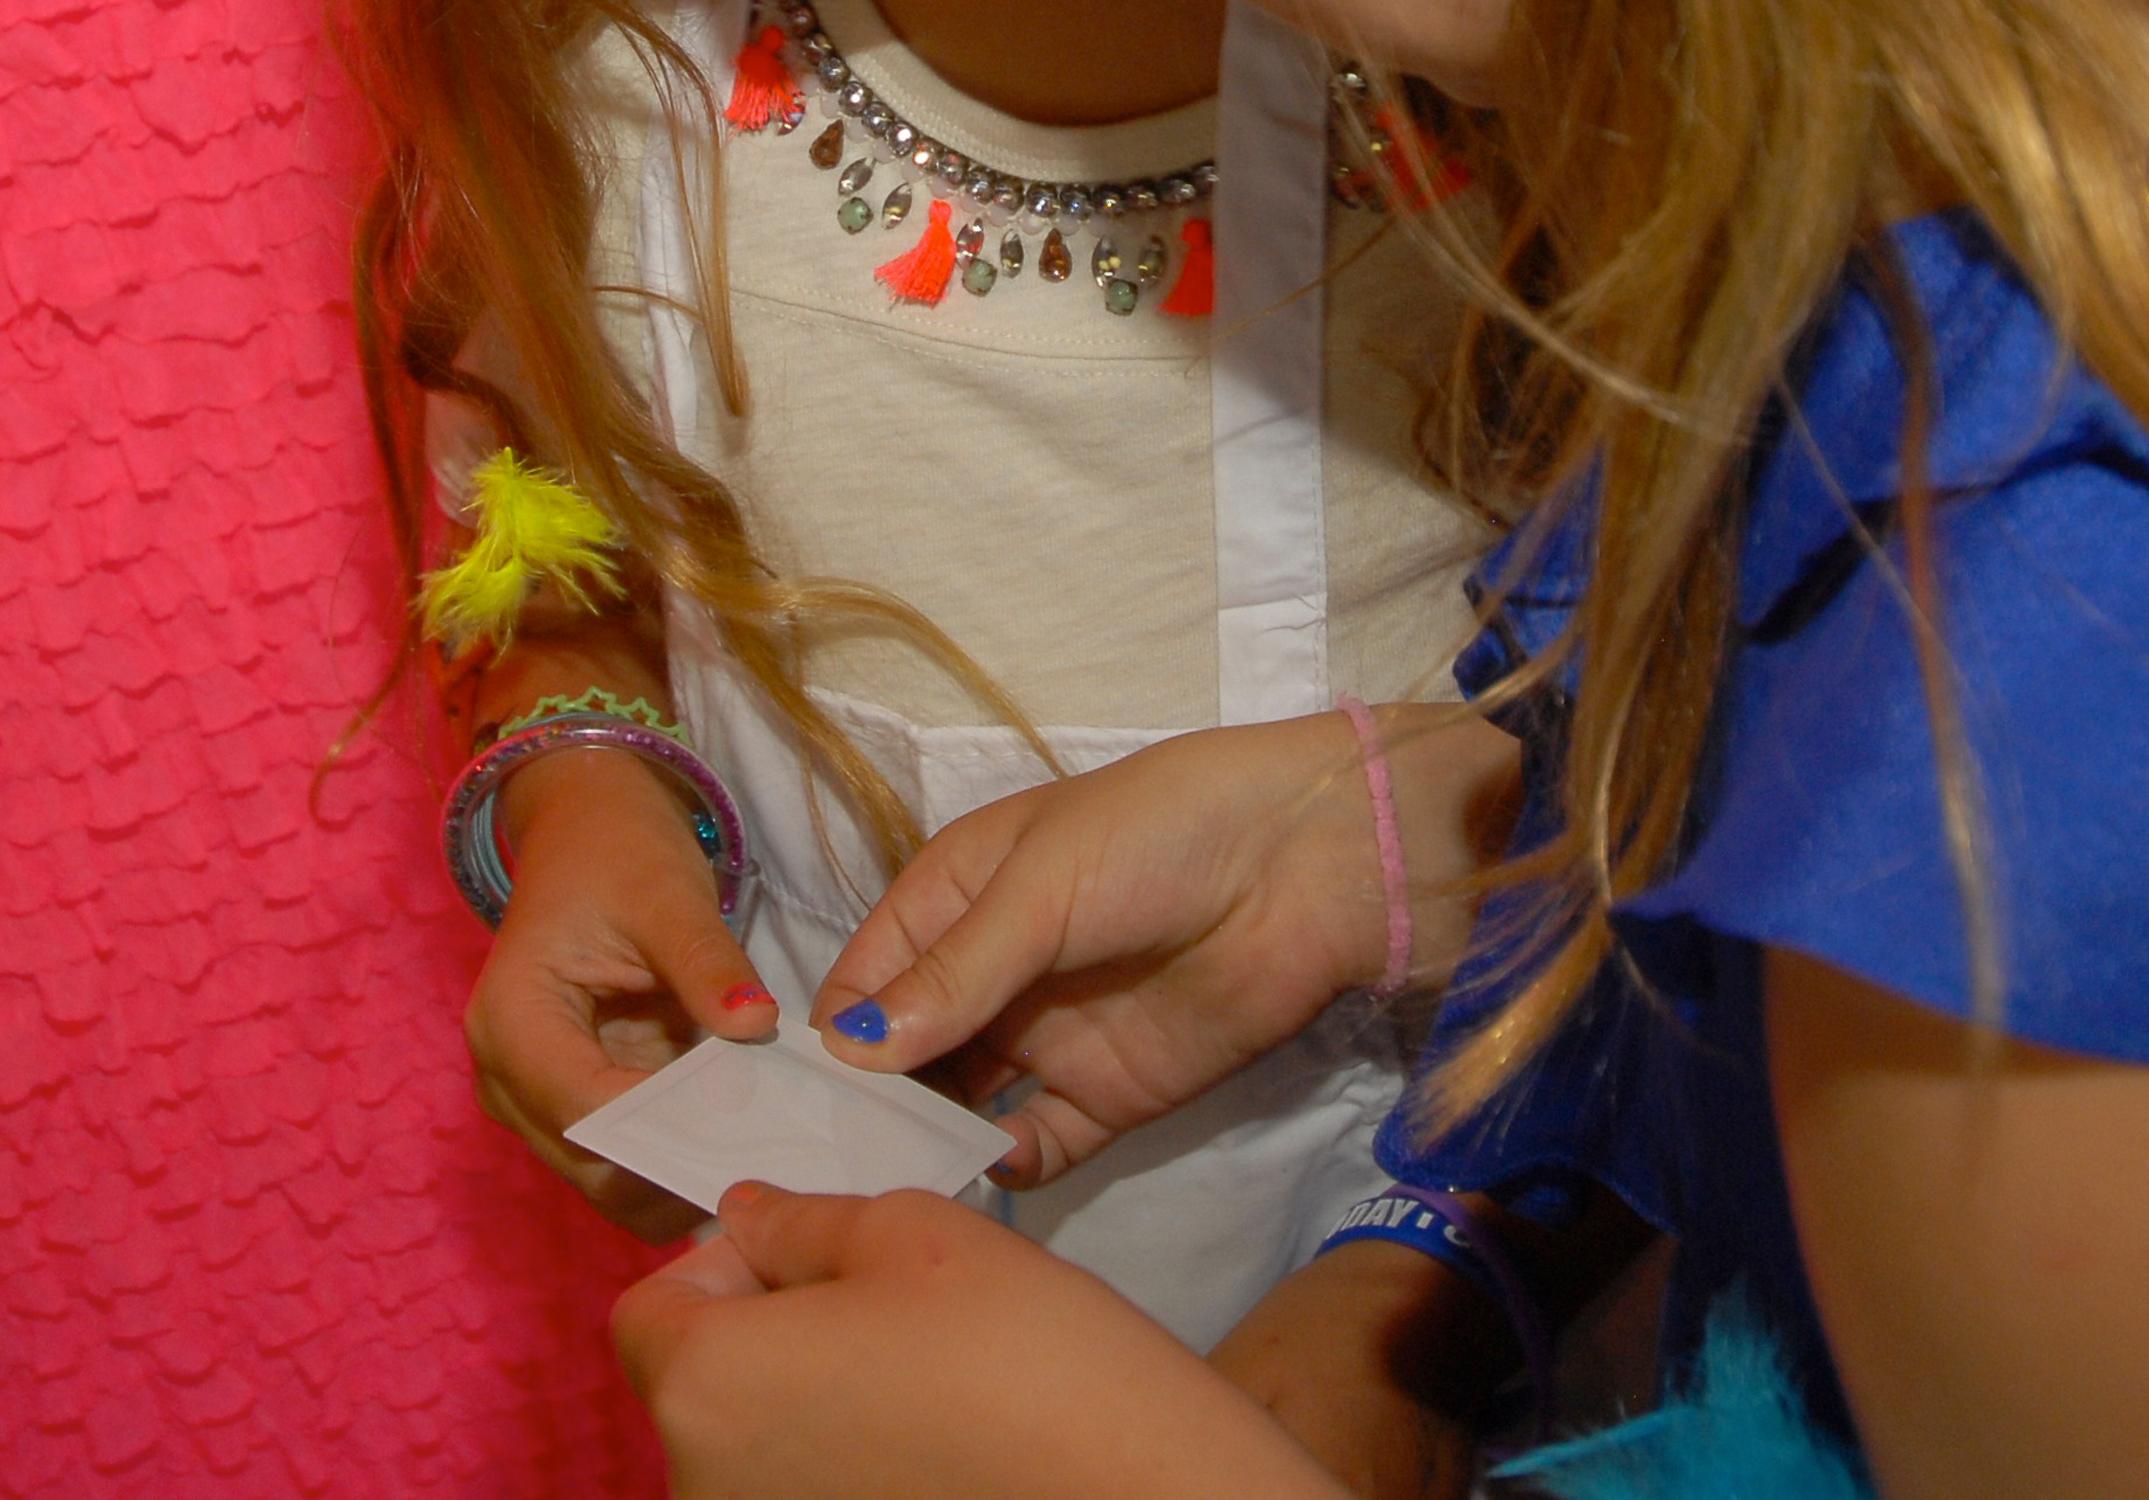 tarynco-events-kids-party-art-carnival-themed-photoboorth-fun.jpg